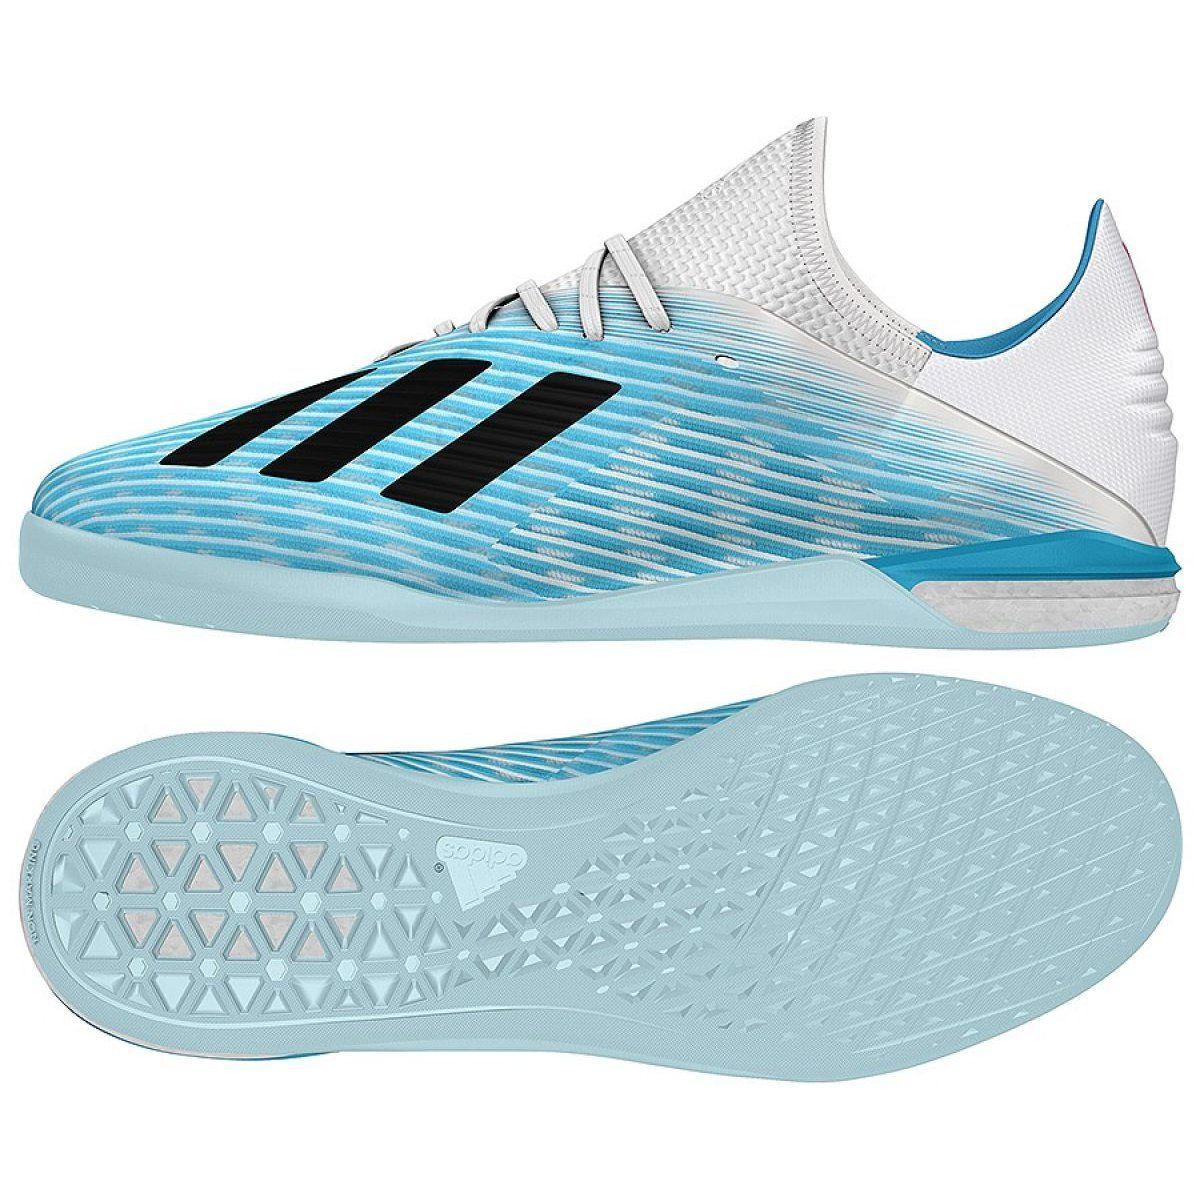 Buty Halowe Adidas X 19 1 In M G25754 Niebieskie Niebieskie Botas De Futbol Futbol Botas